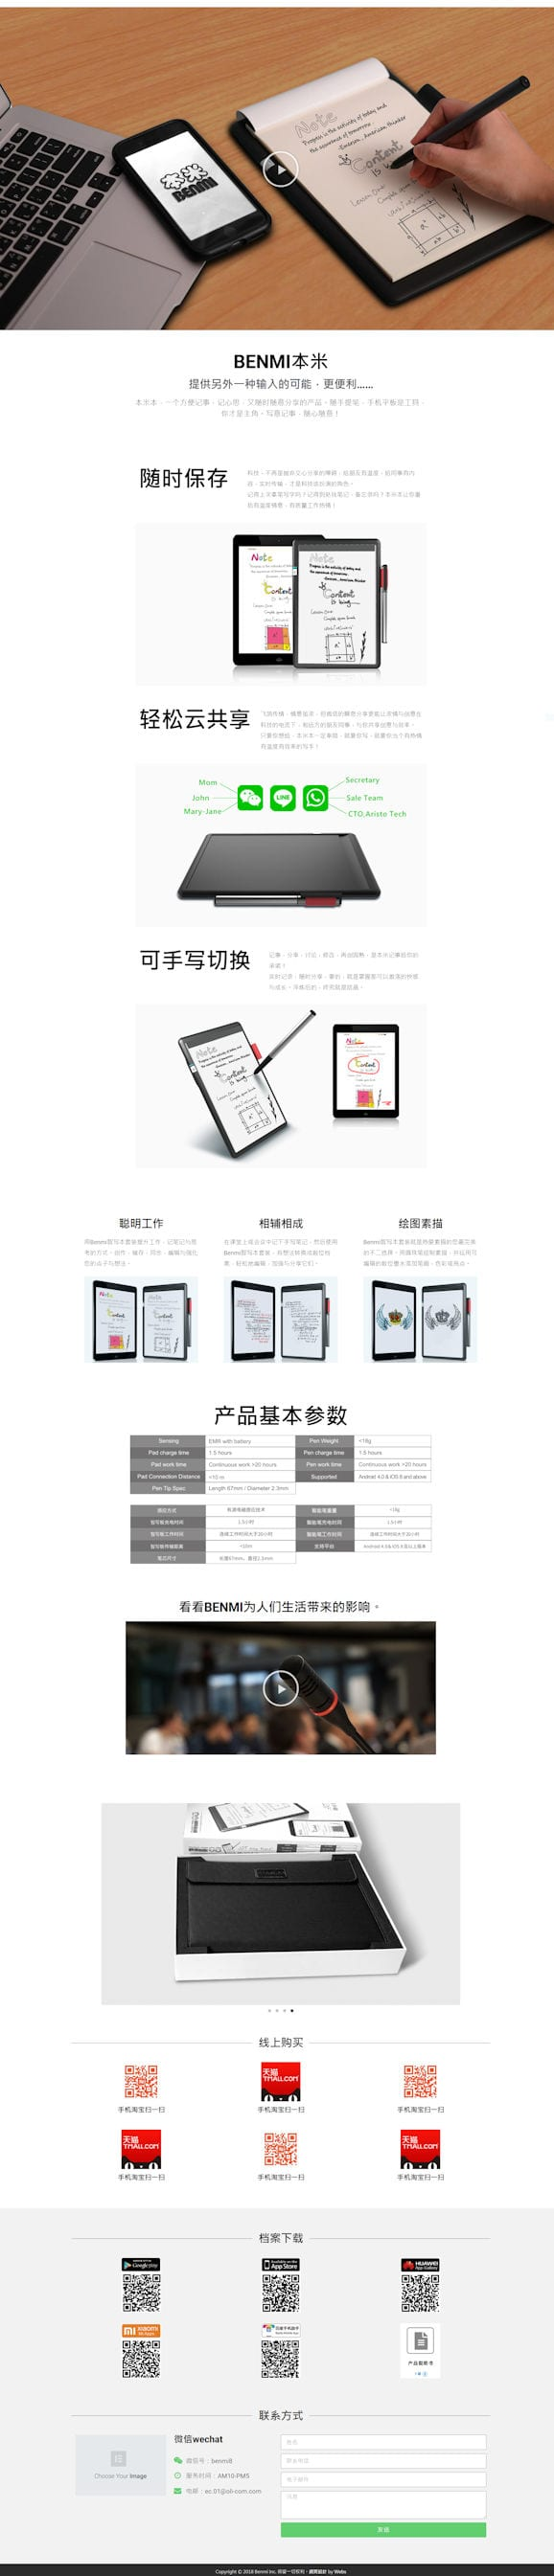 網頁設計-BENMI本米1